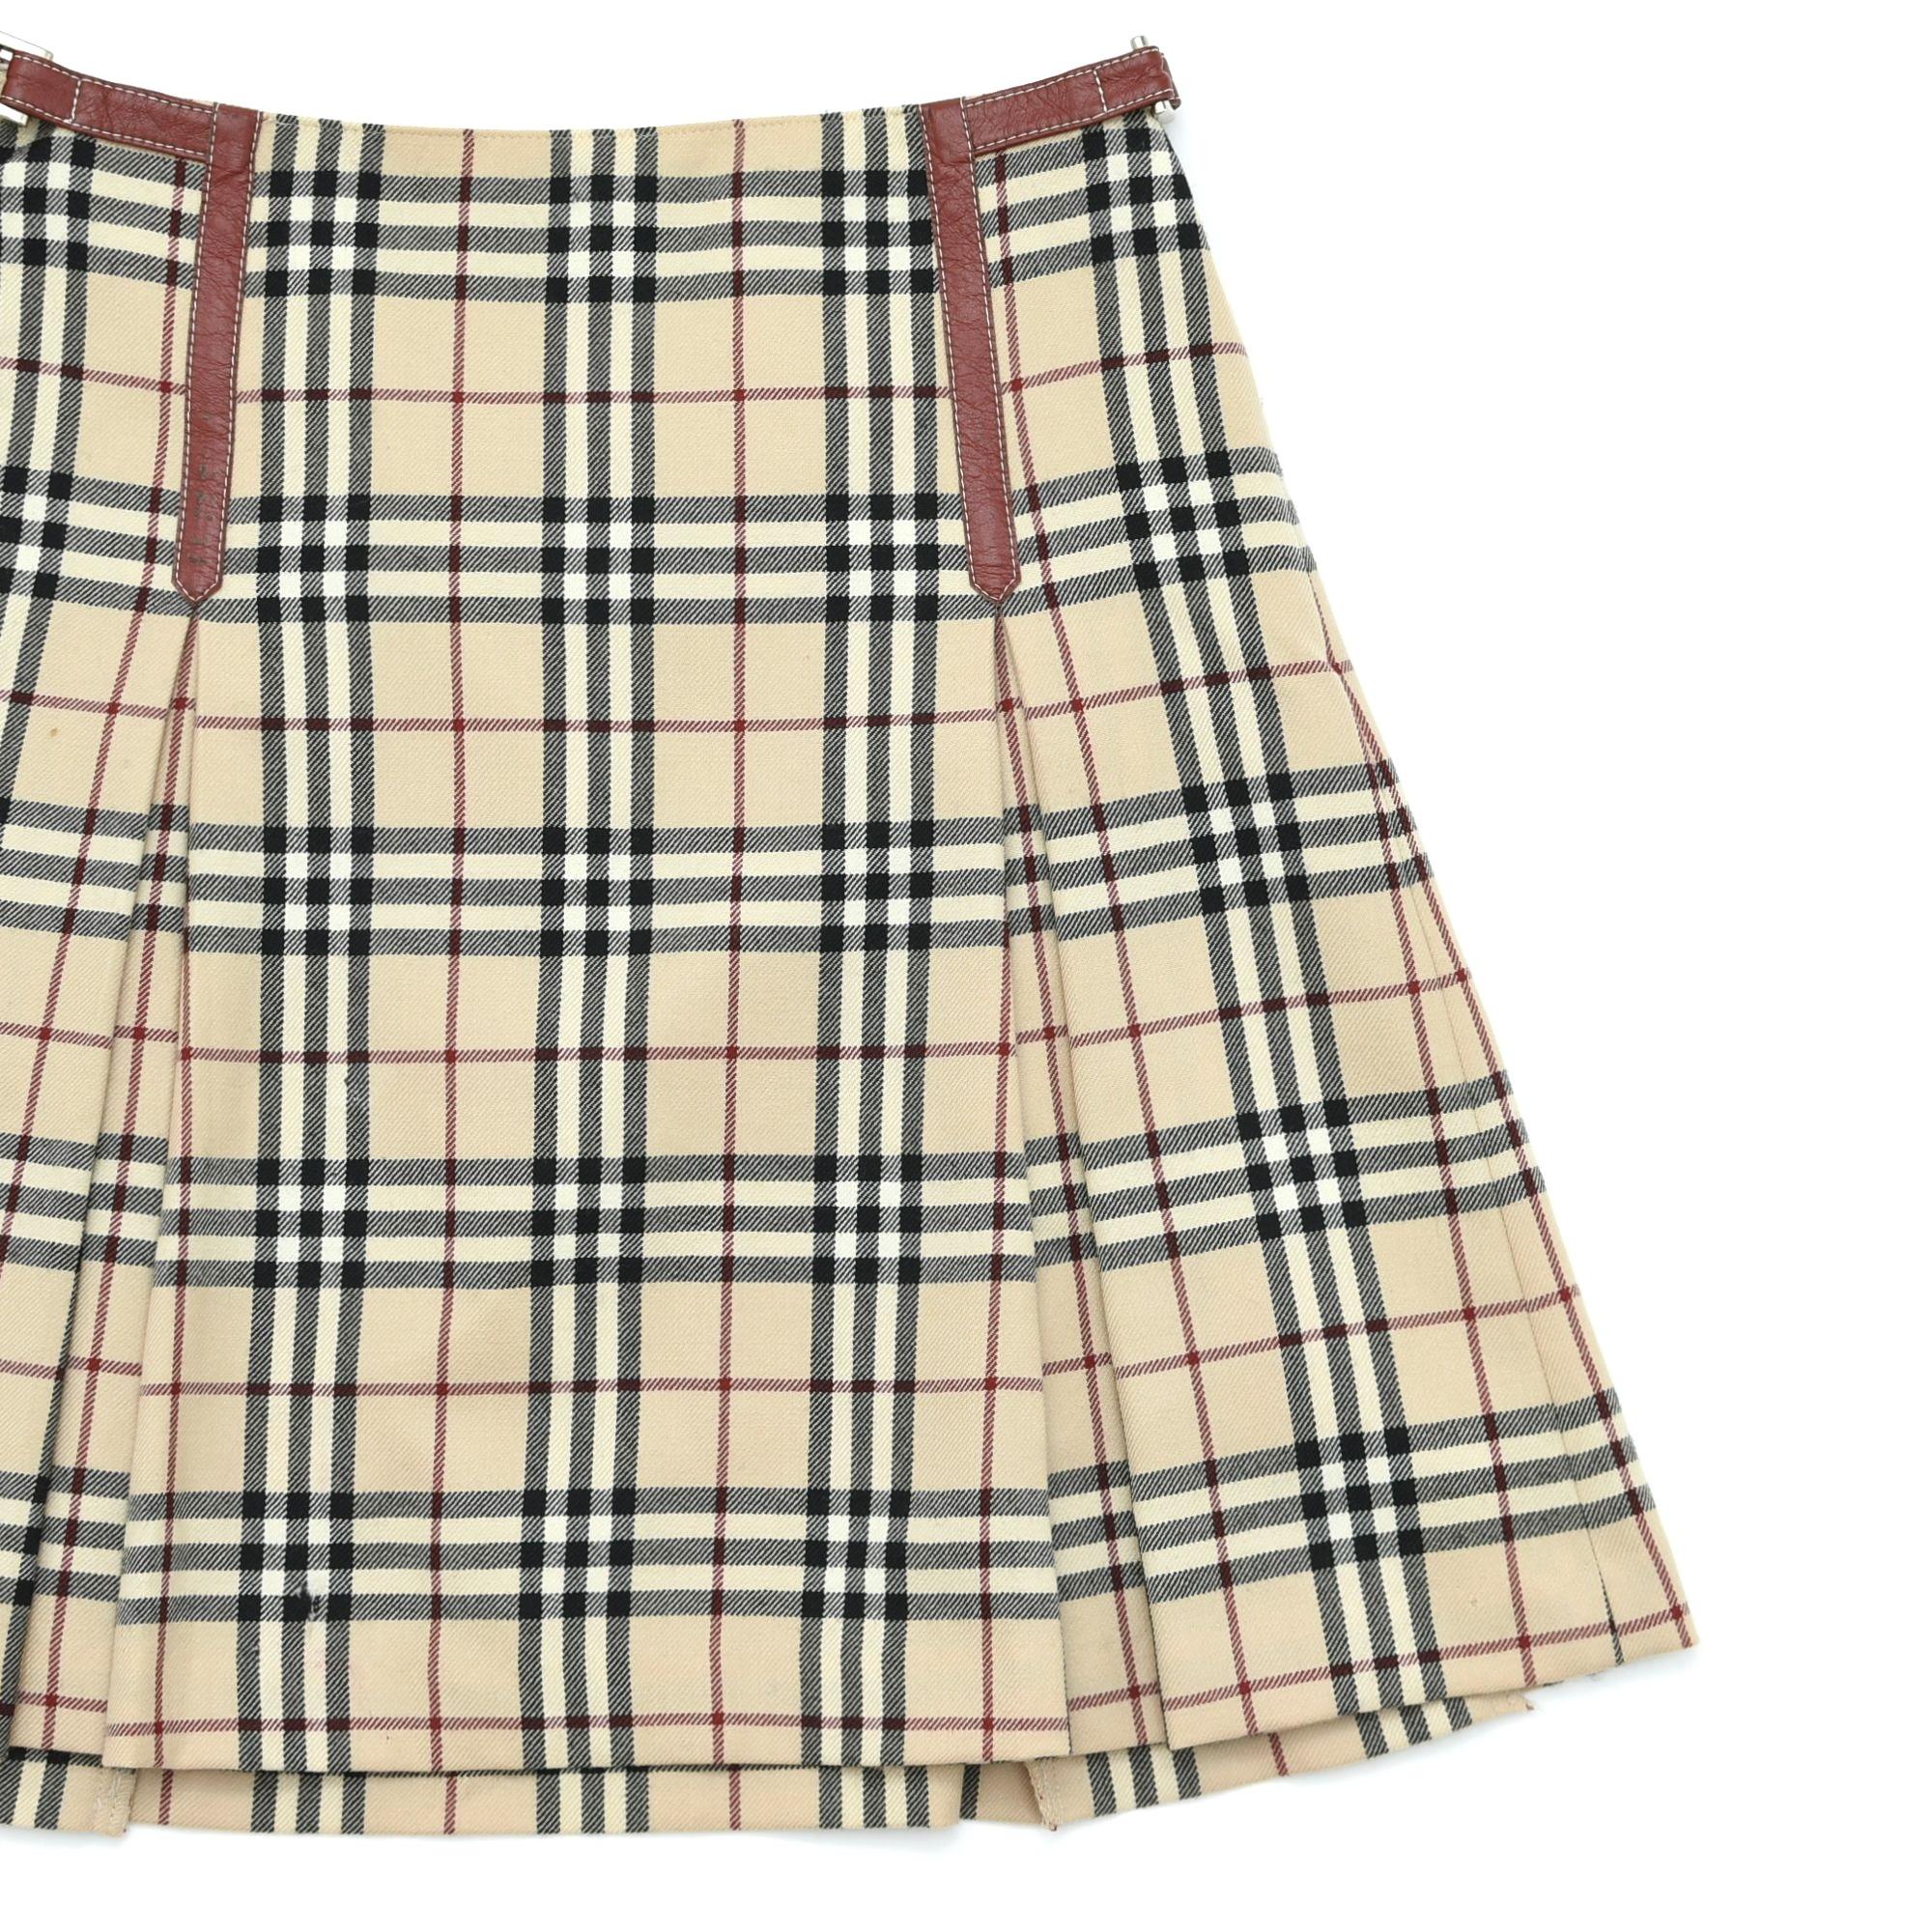 BURBERRY BLUE LABEL Nova check mini skirt